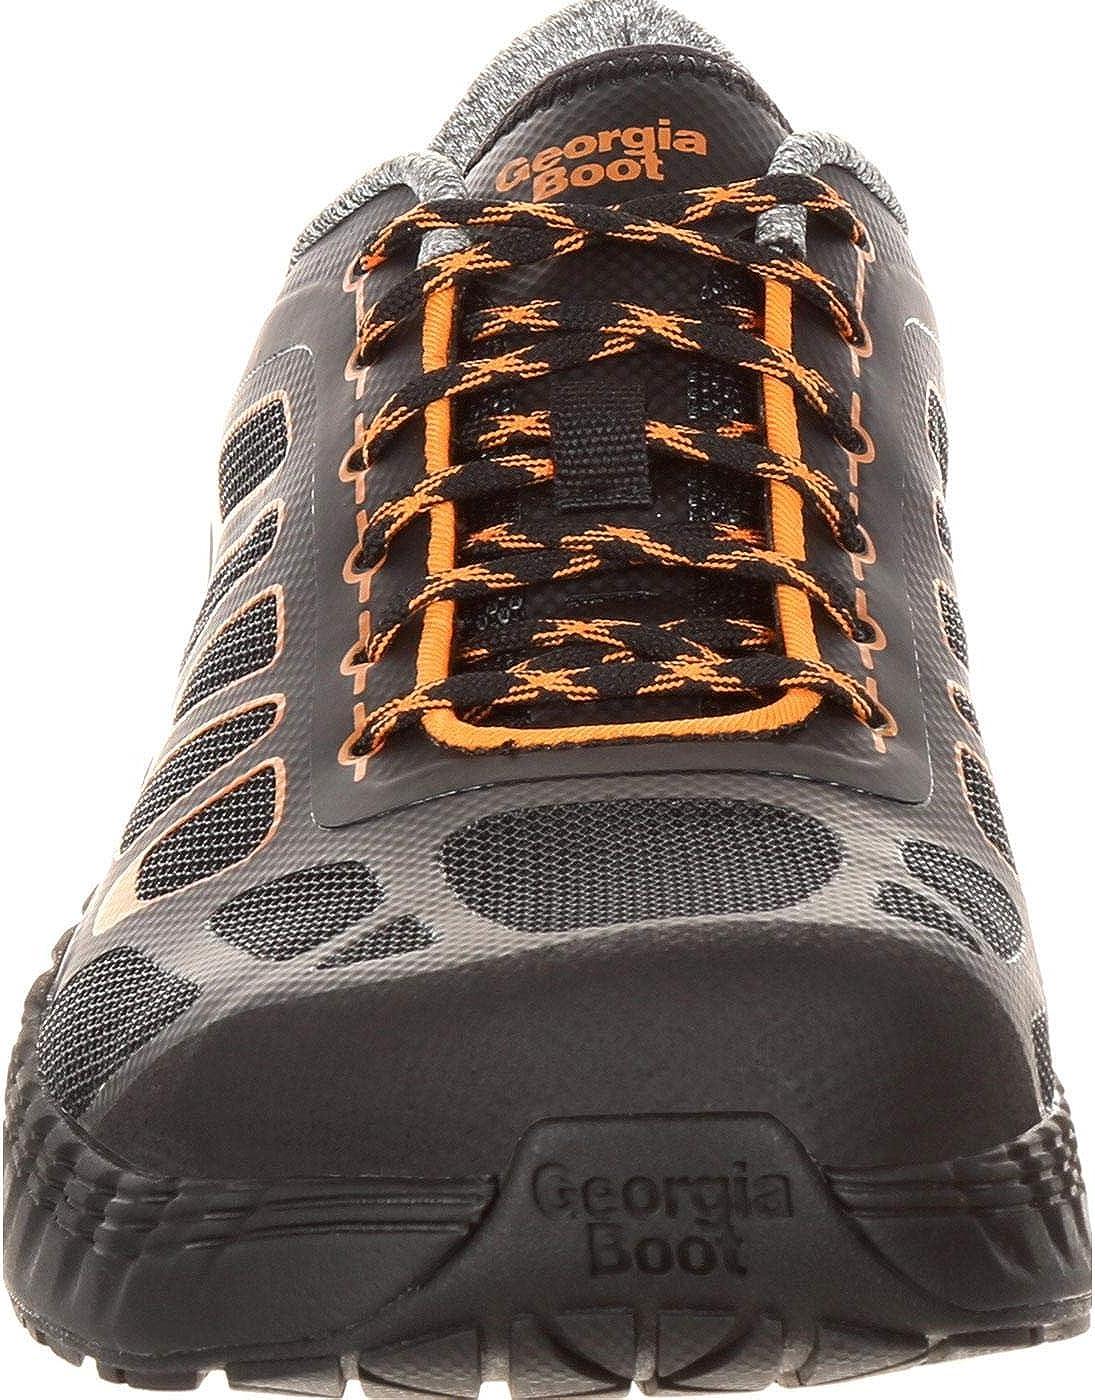 Georgia Boot Mens ReFLX Alloy Toe